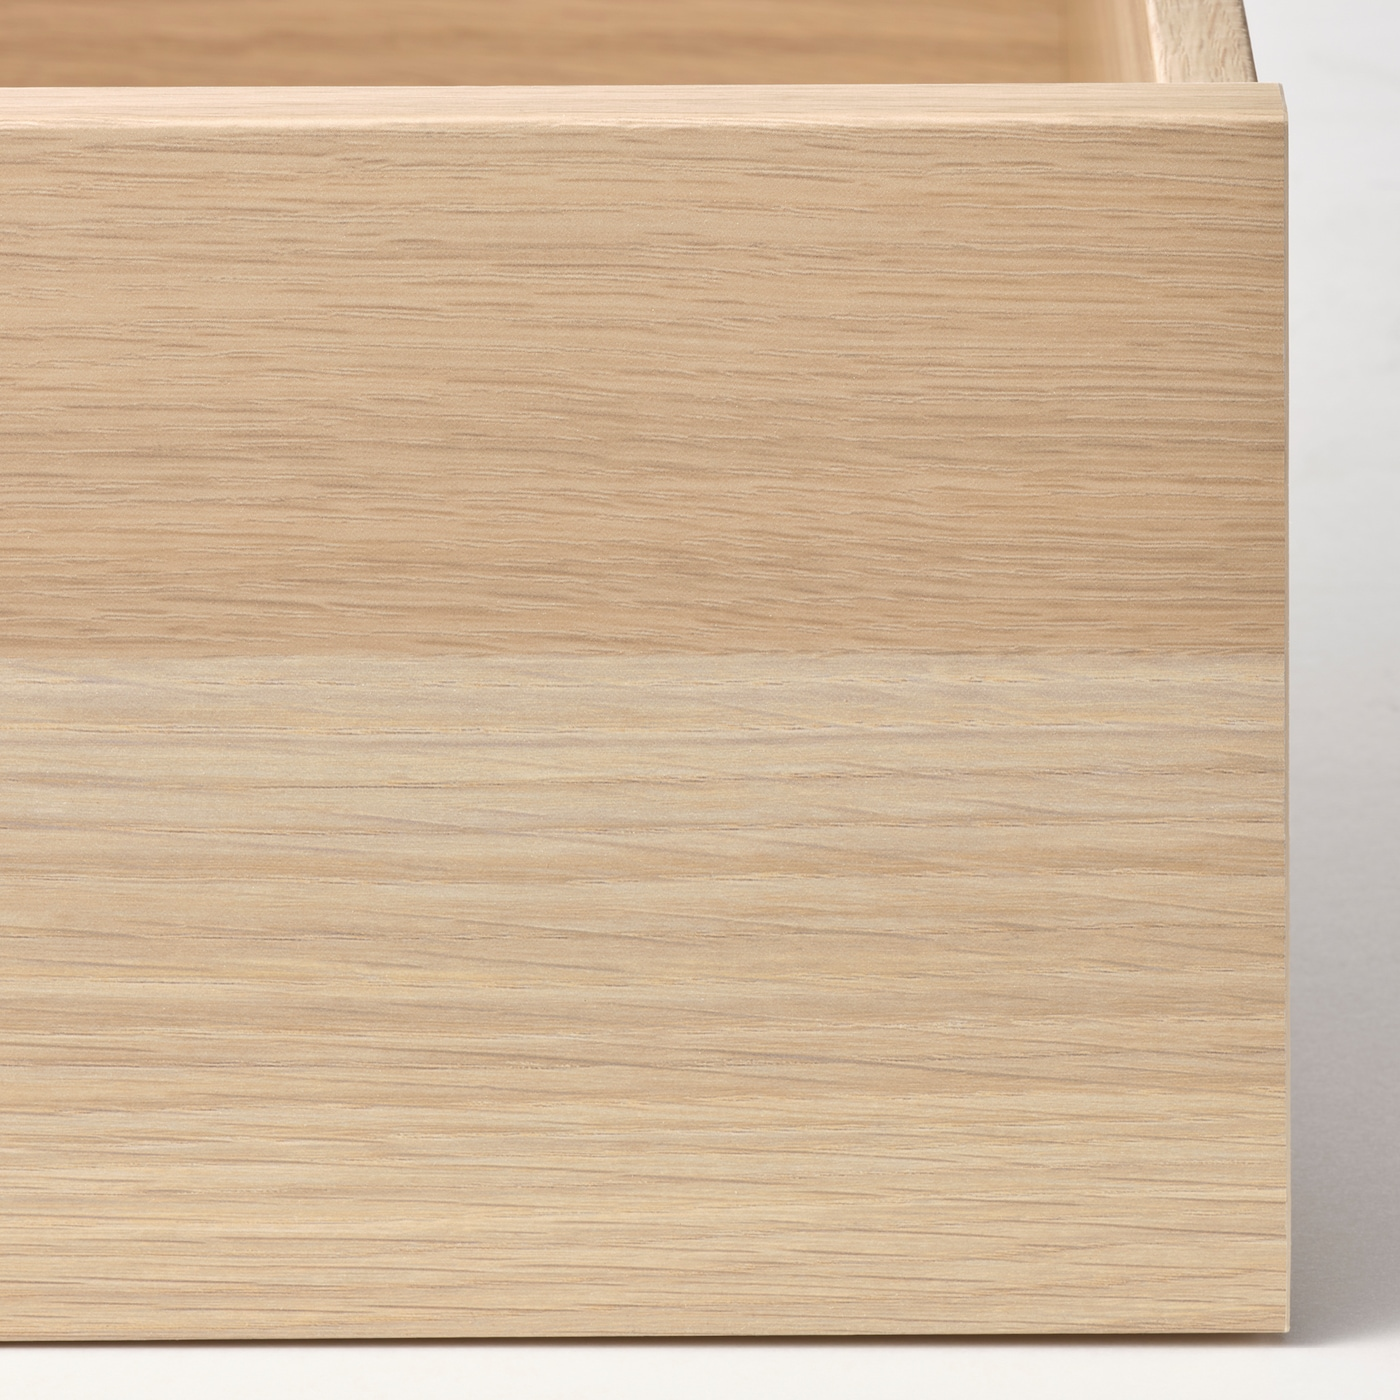 KOMPLEMENT Ladica, efekt bijelo bajcanog hrasta, 75x35 cm